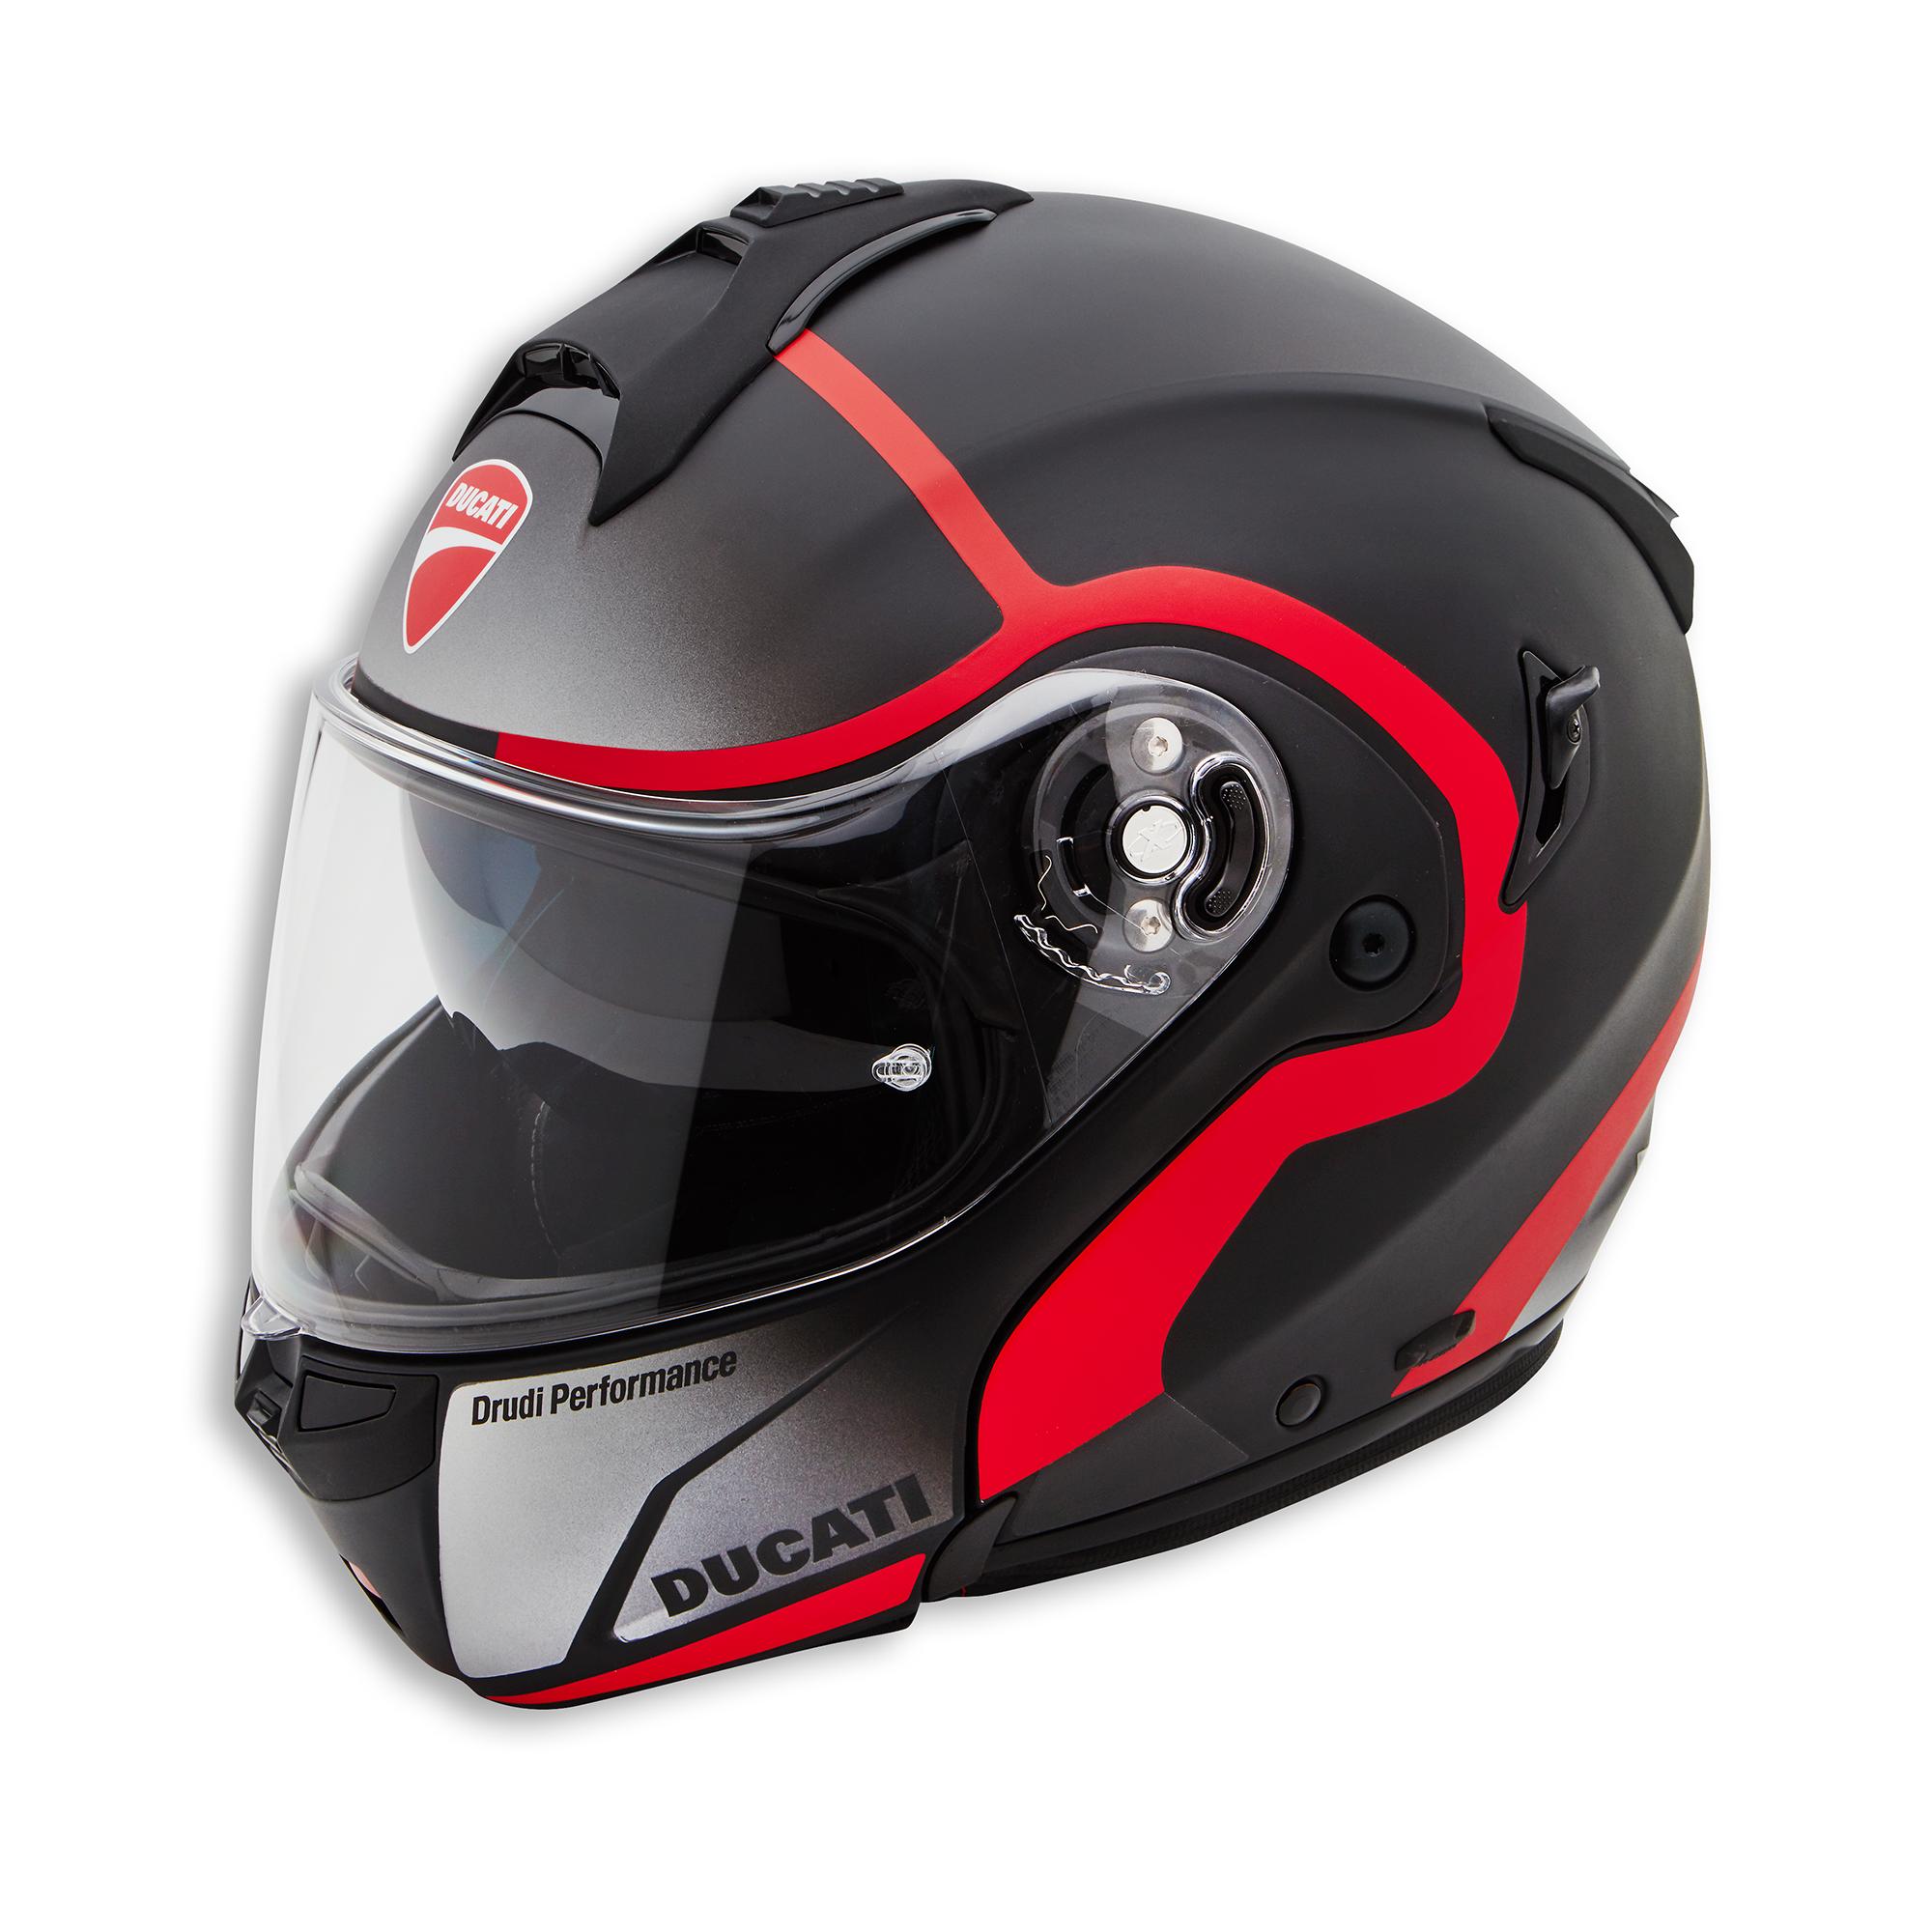 Ducati Horizon Modular helmet